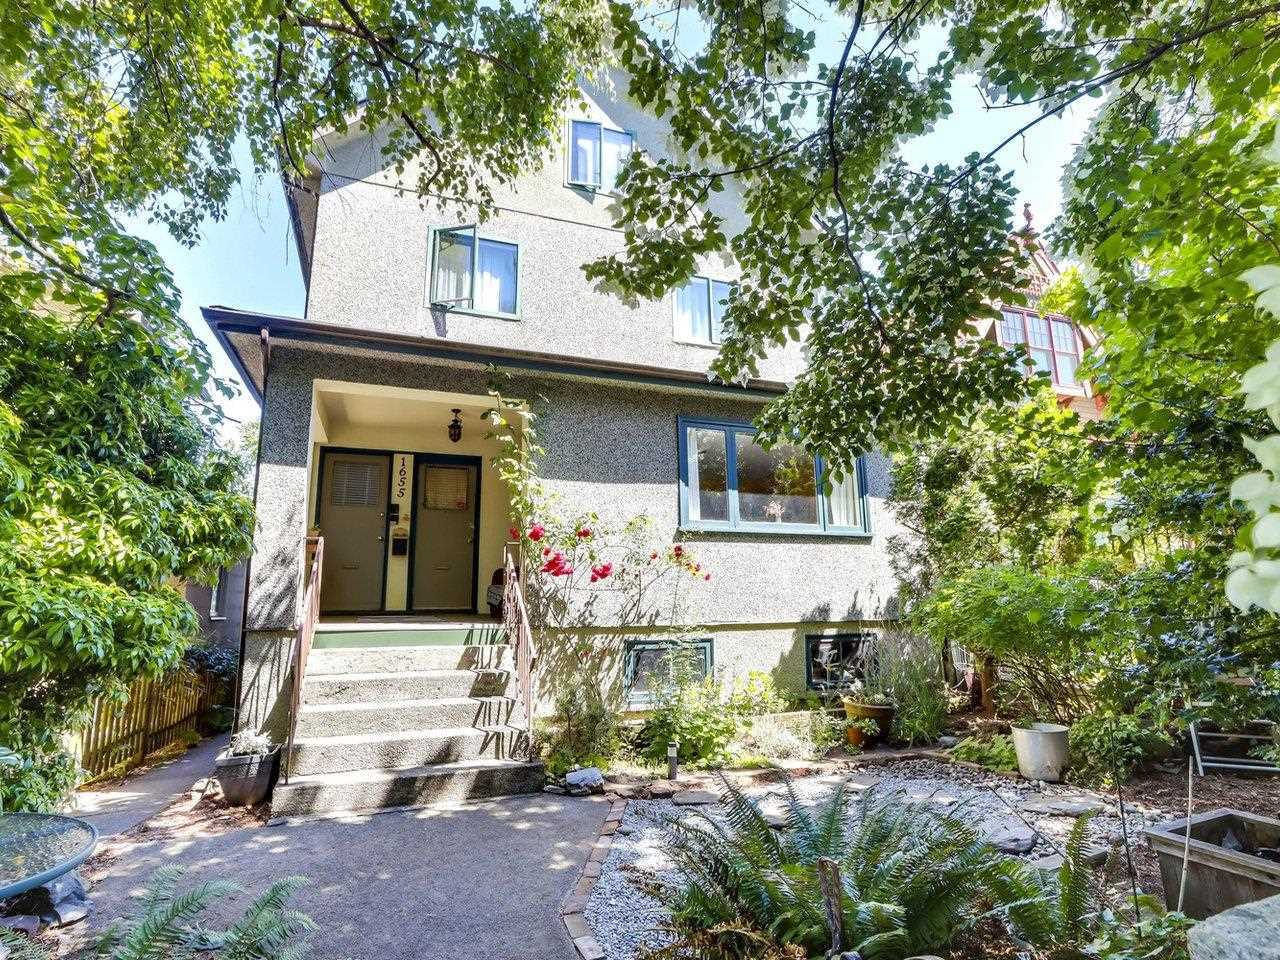 1655 ADANAC STREET - Hastings House/Single Family for sale, 6 Bedrooms (R2598033) - #1